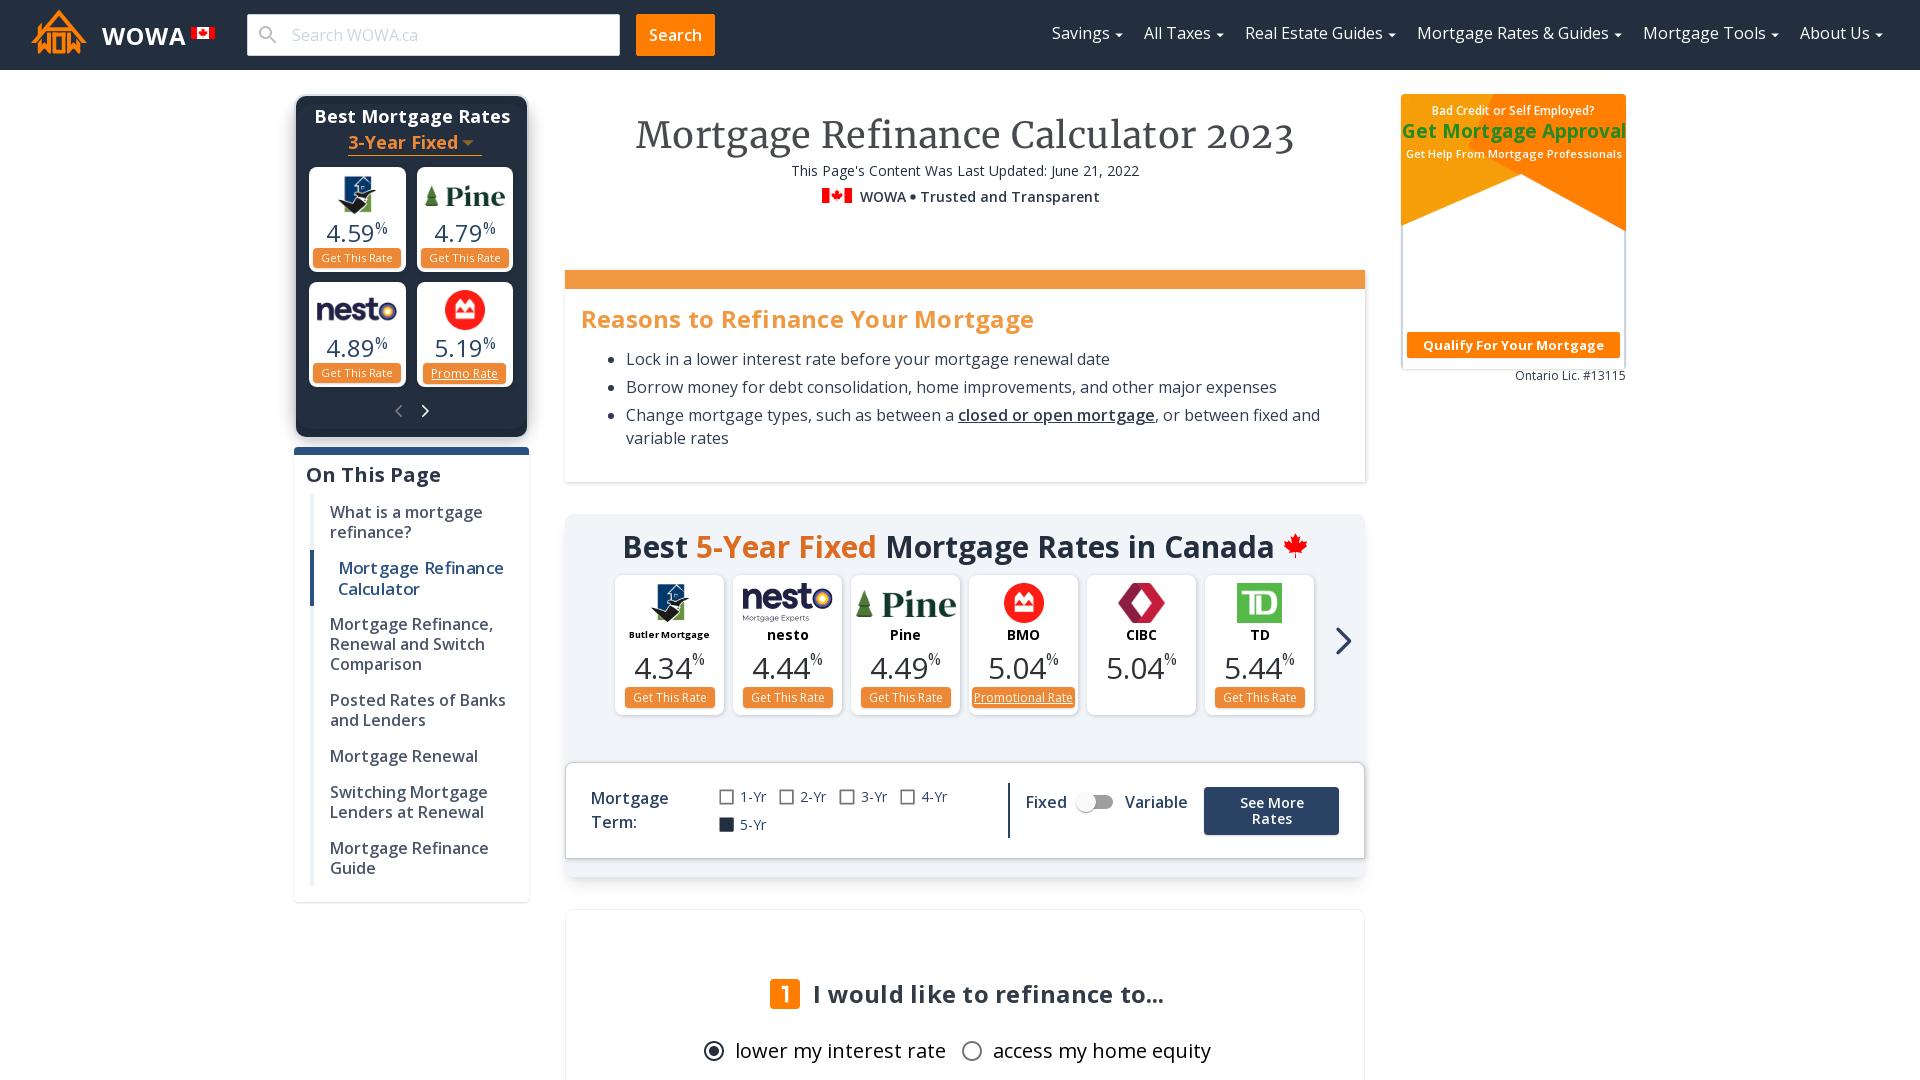 Canada Mortgage Refinance Calculator 2020 | WOWA.ca